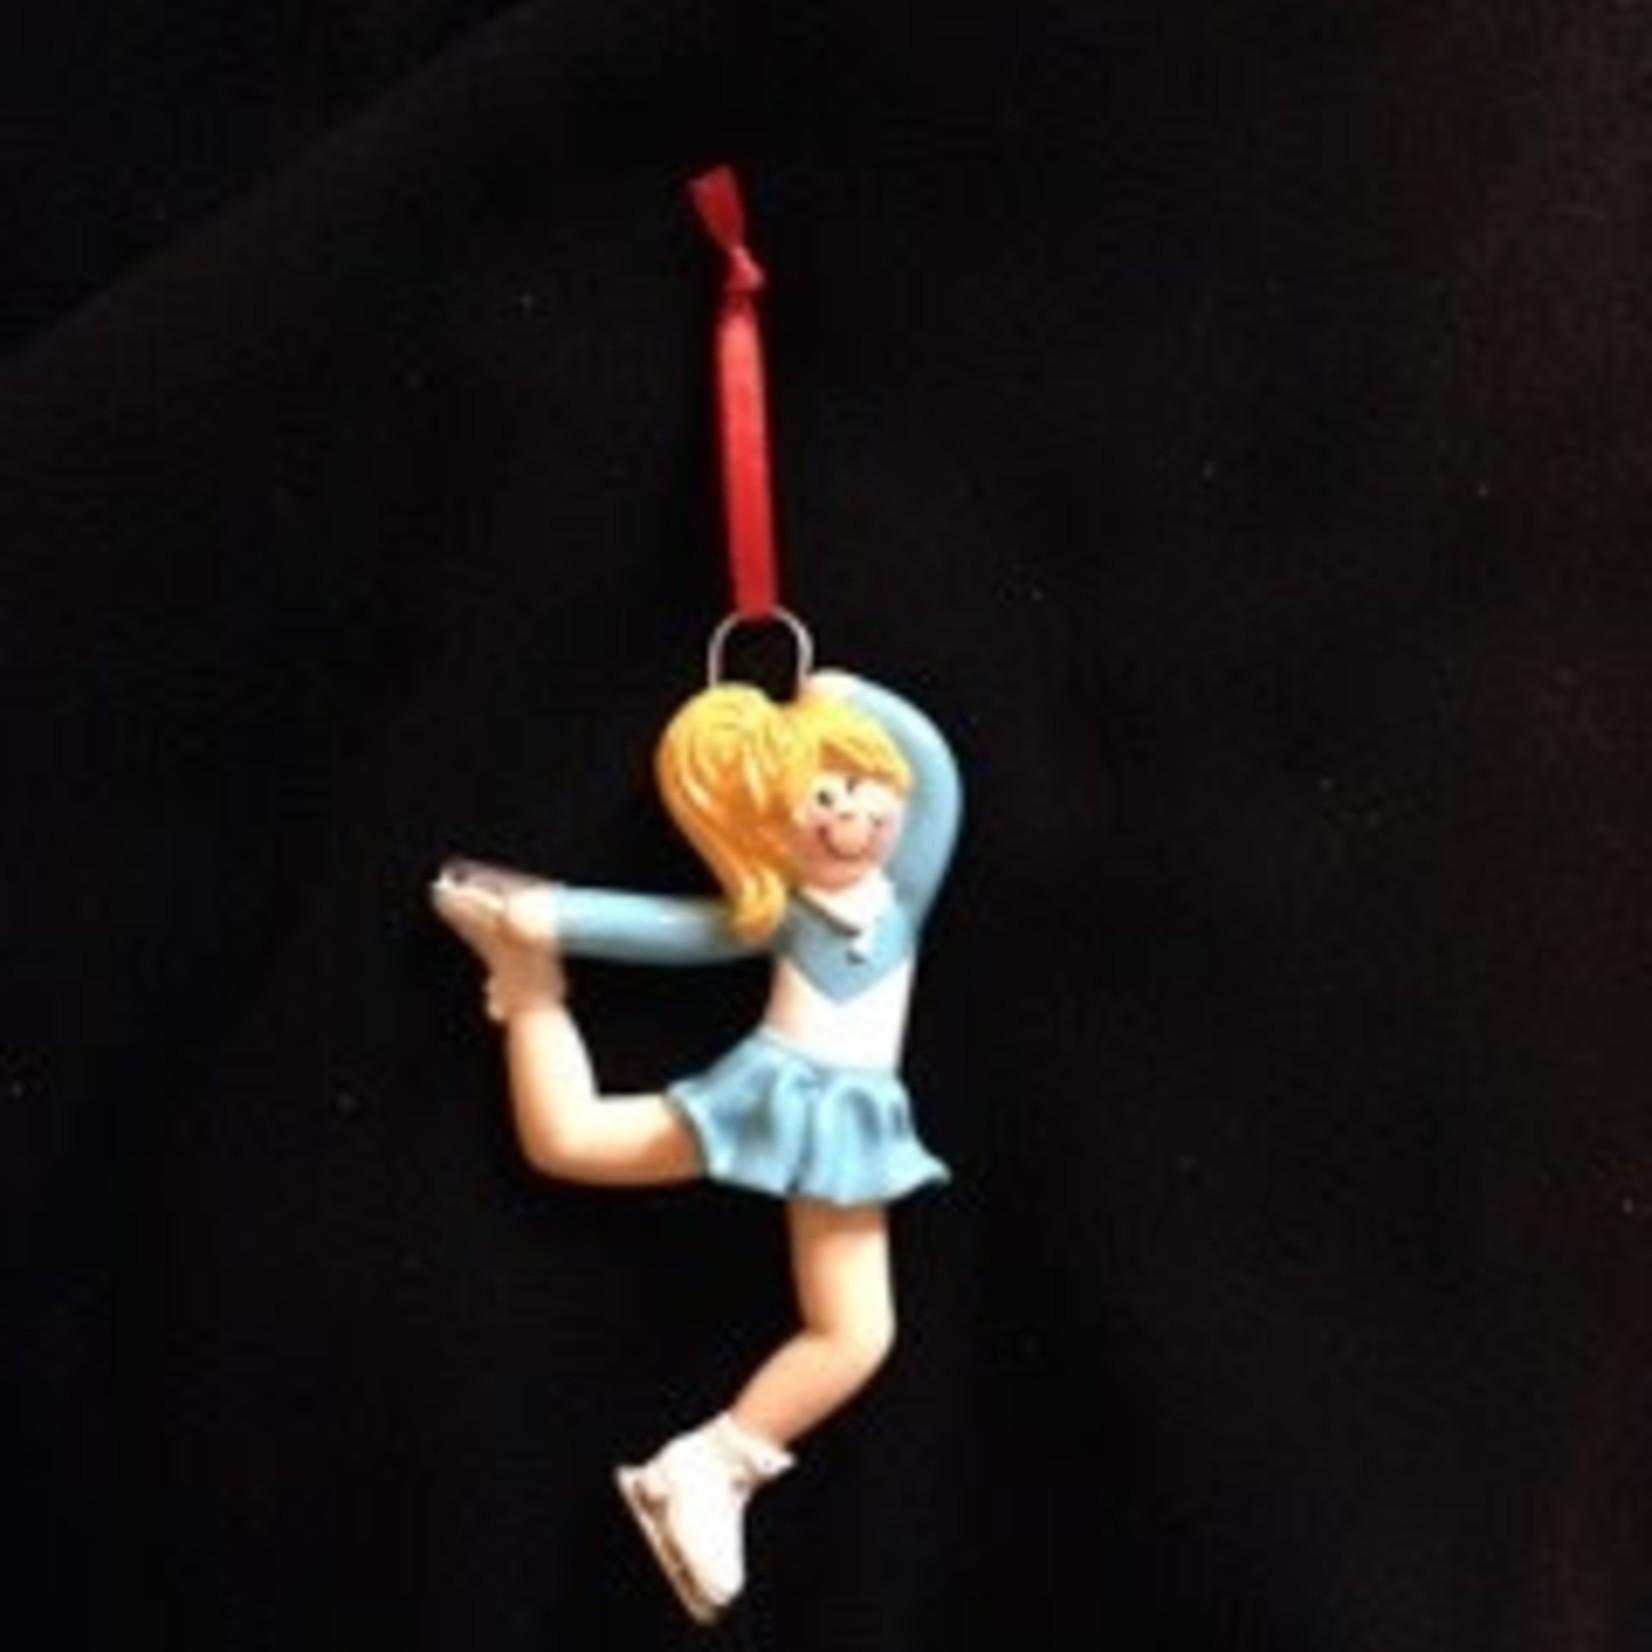 Figureskater Girl Orn - Blonde